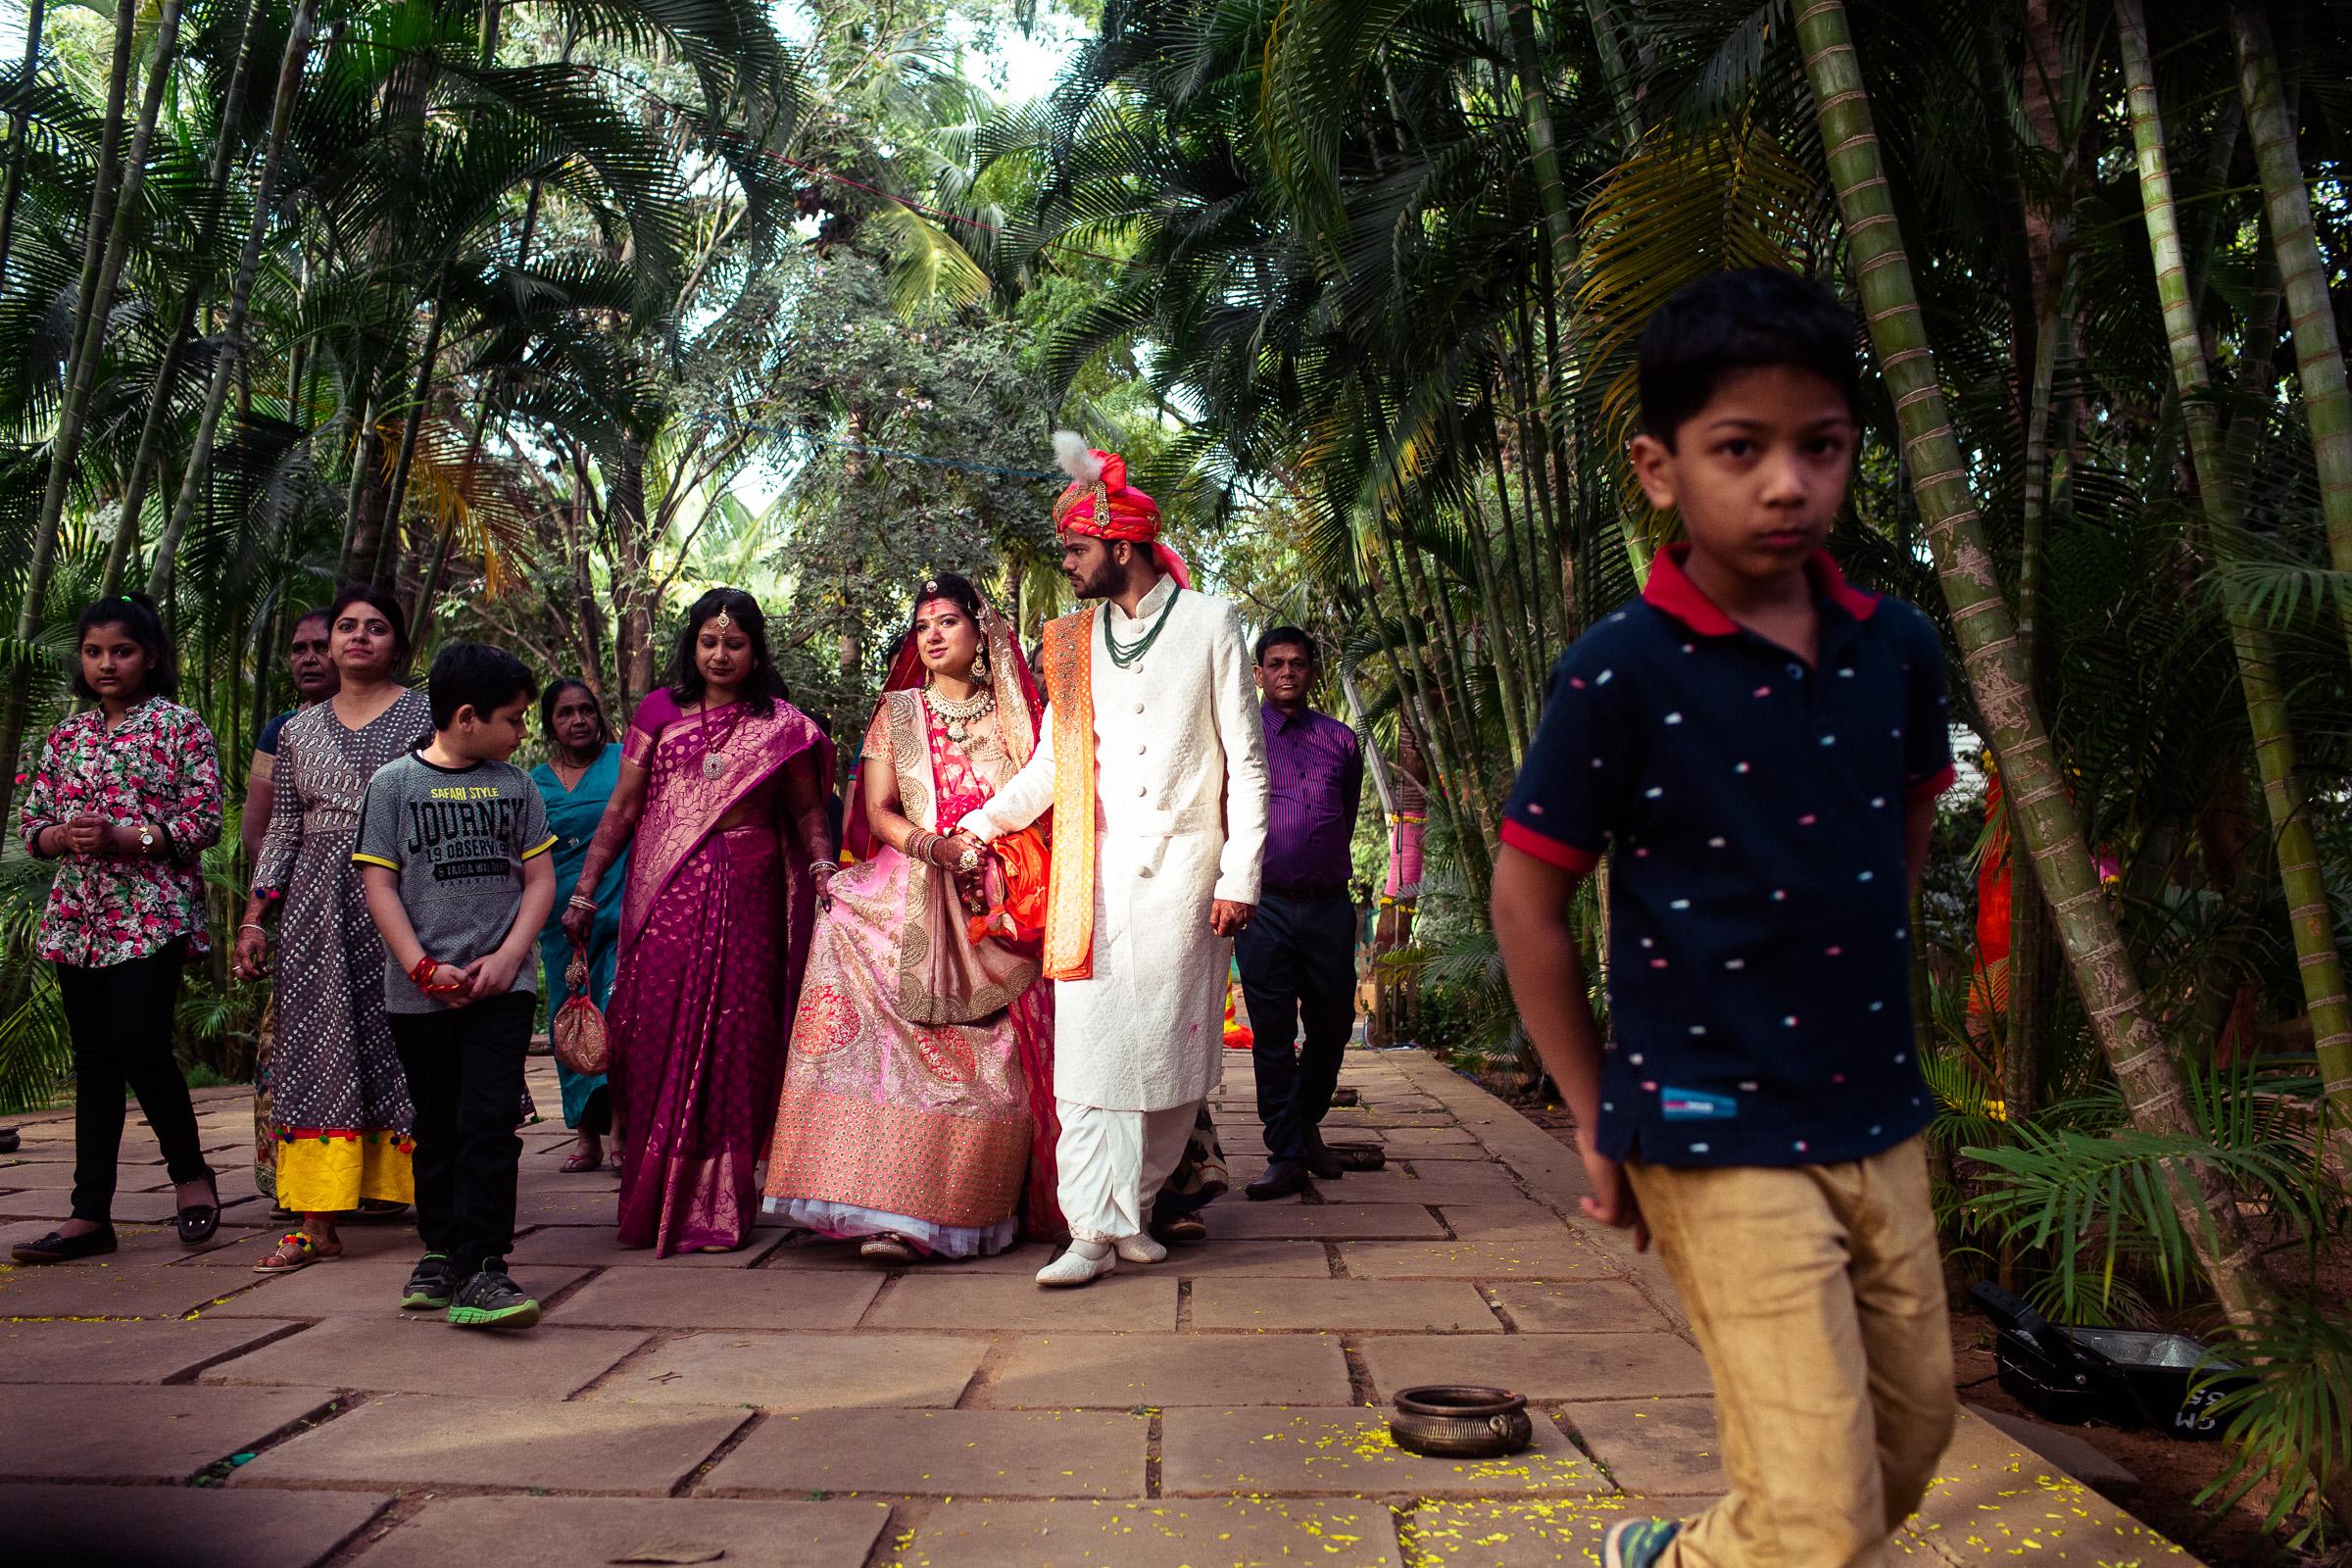 marwari-candid-wedding-photographers-bangalore-0056.jpg